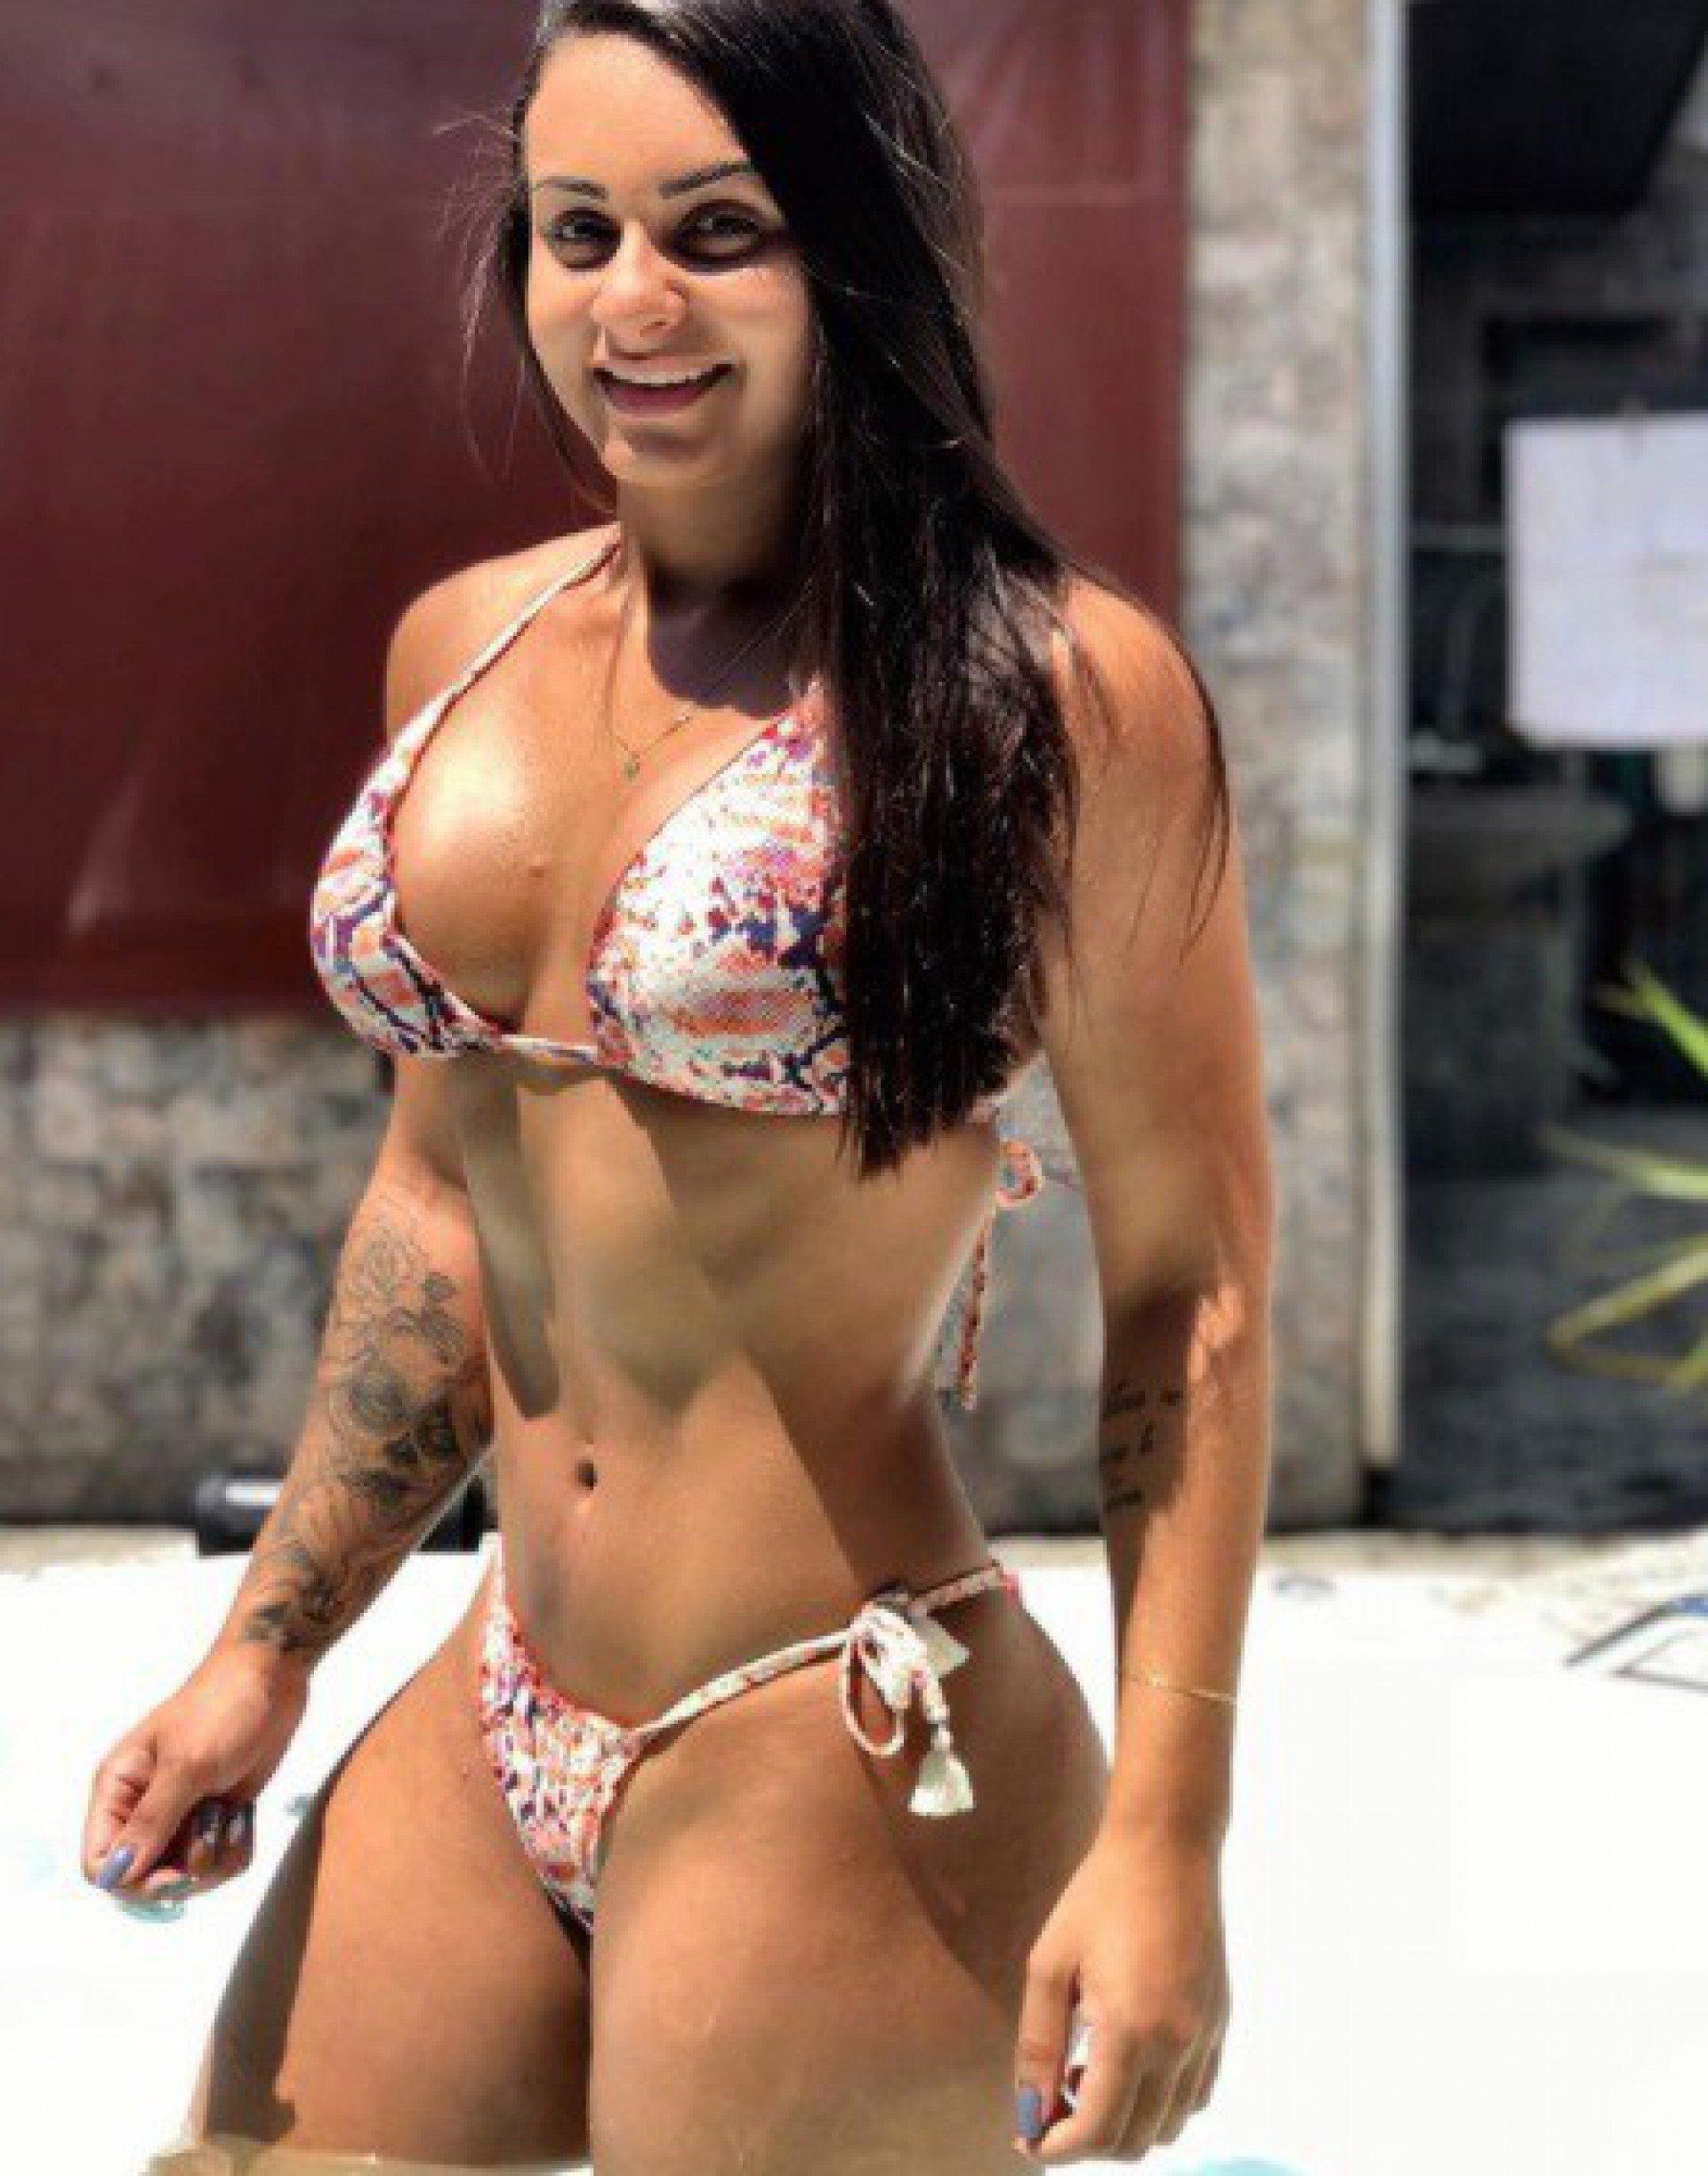 Fotos! Musa fitness exibe corpo perfeito e bomba no Instagram